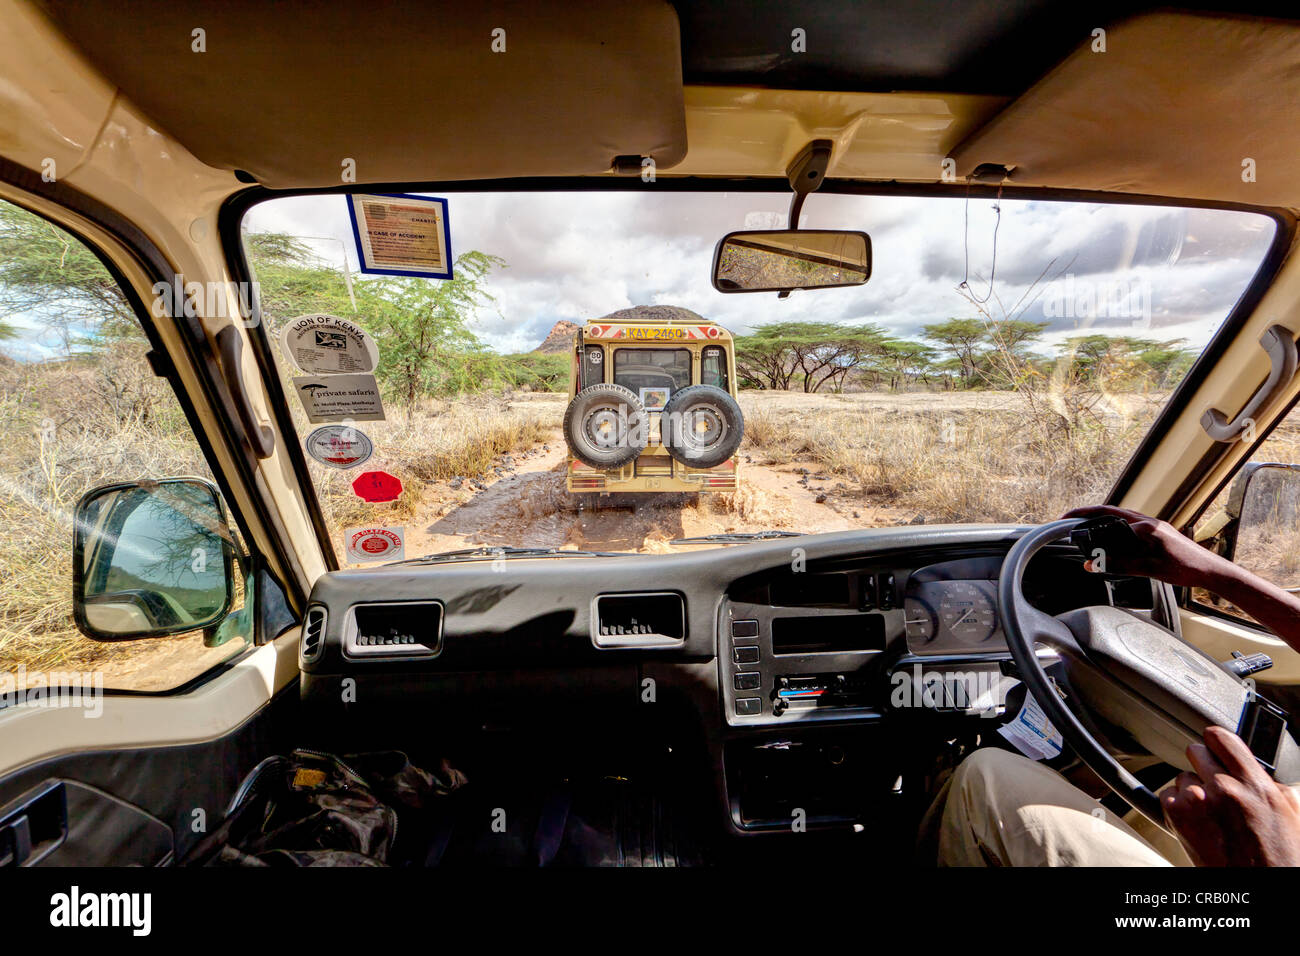 Safaribus nach einem Landrover über nasse Feldwege in Samburu National Reserve, Kenia, Ostafrika, Afrika, PublicGround Stockfoto